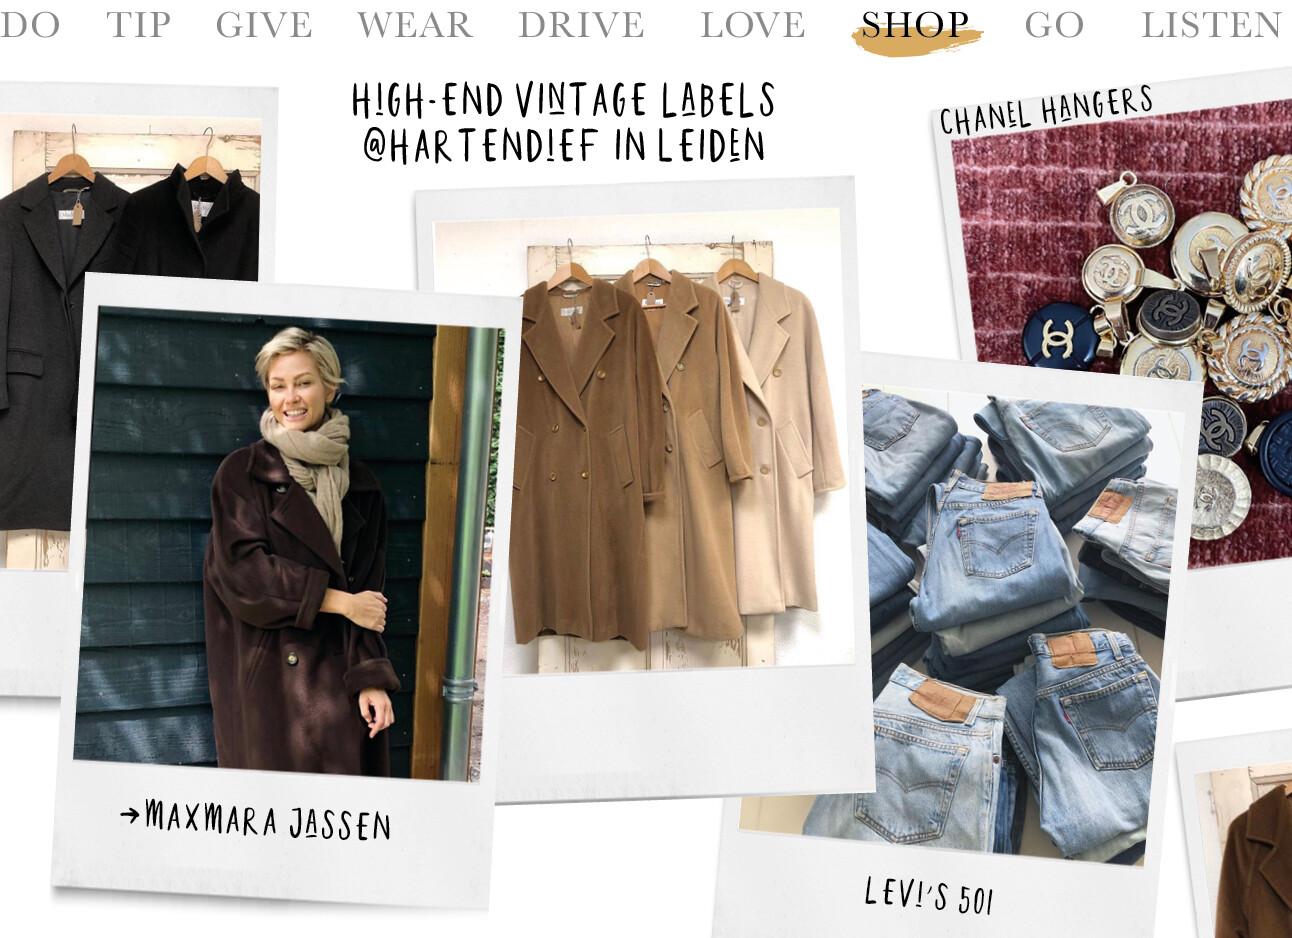 Hartendief vintage MaxMara jassen Levi's Jeans chanel hangers